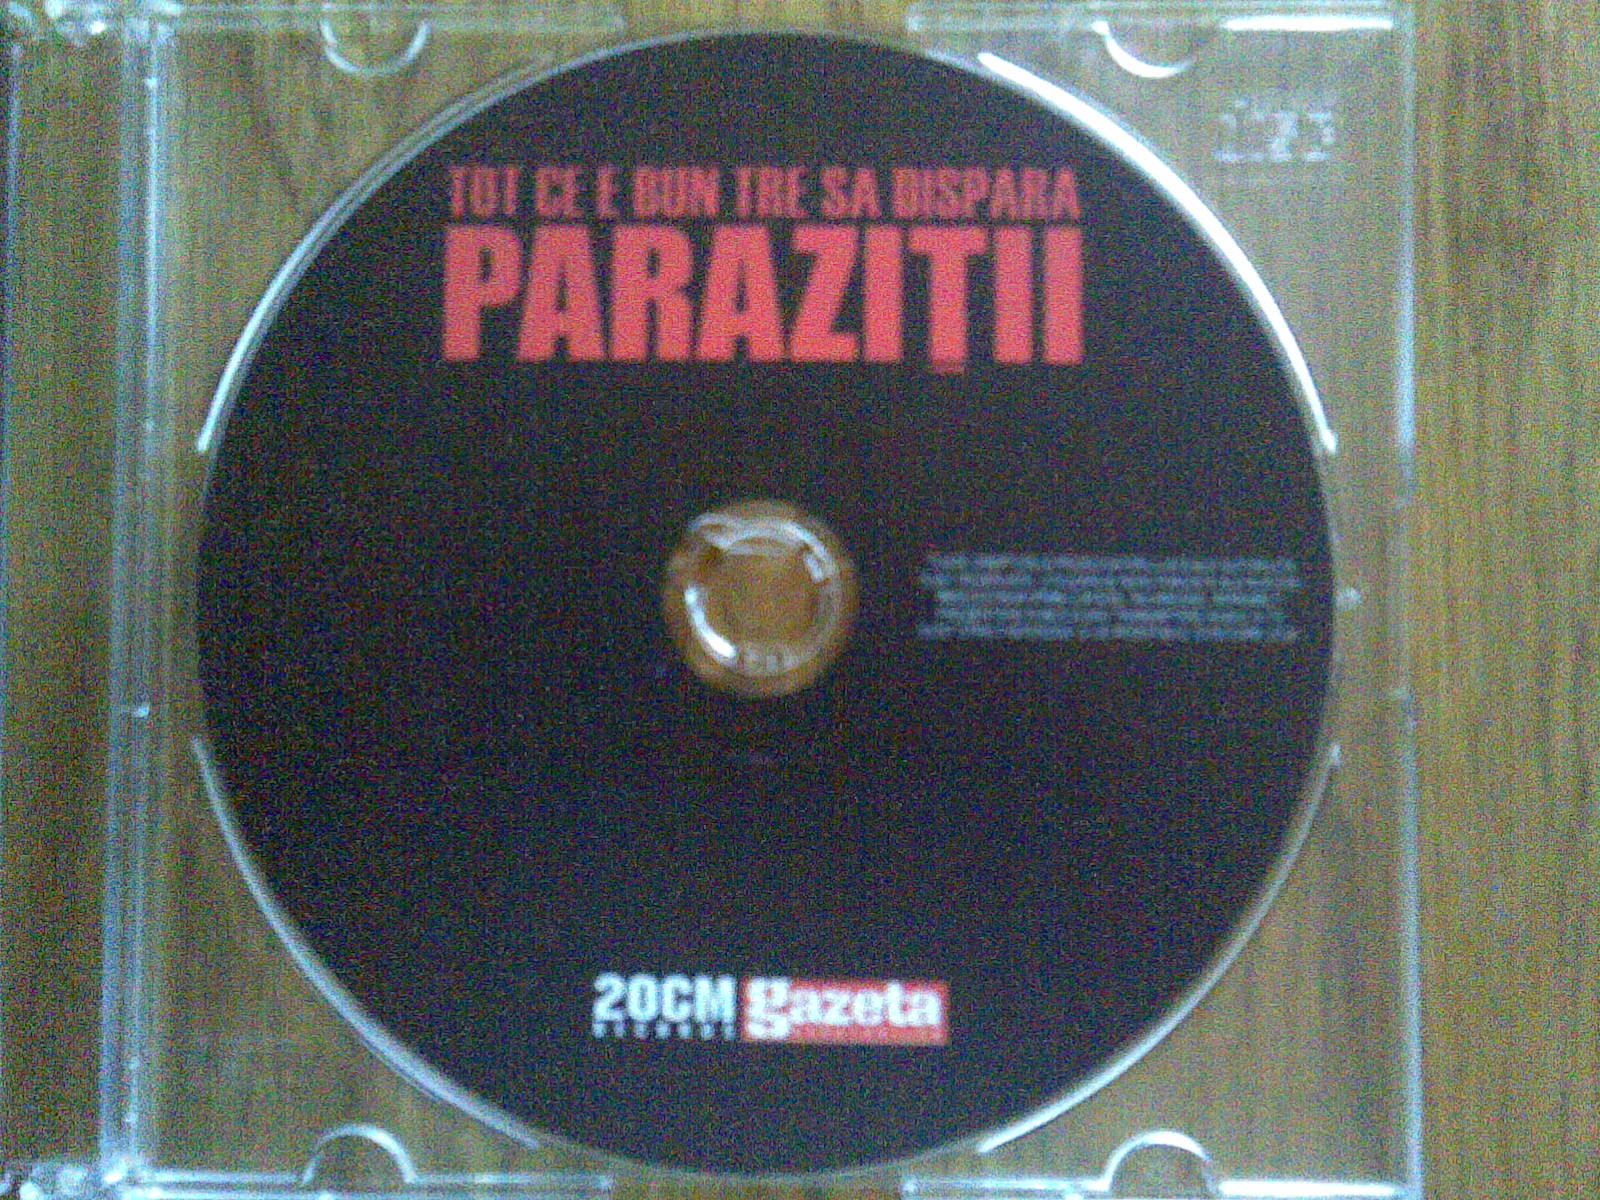 parazitii flac)